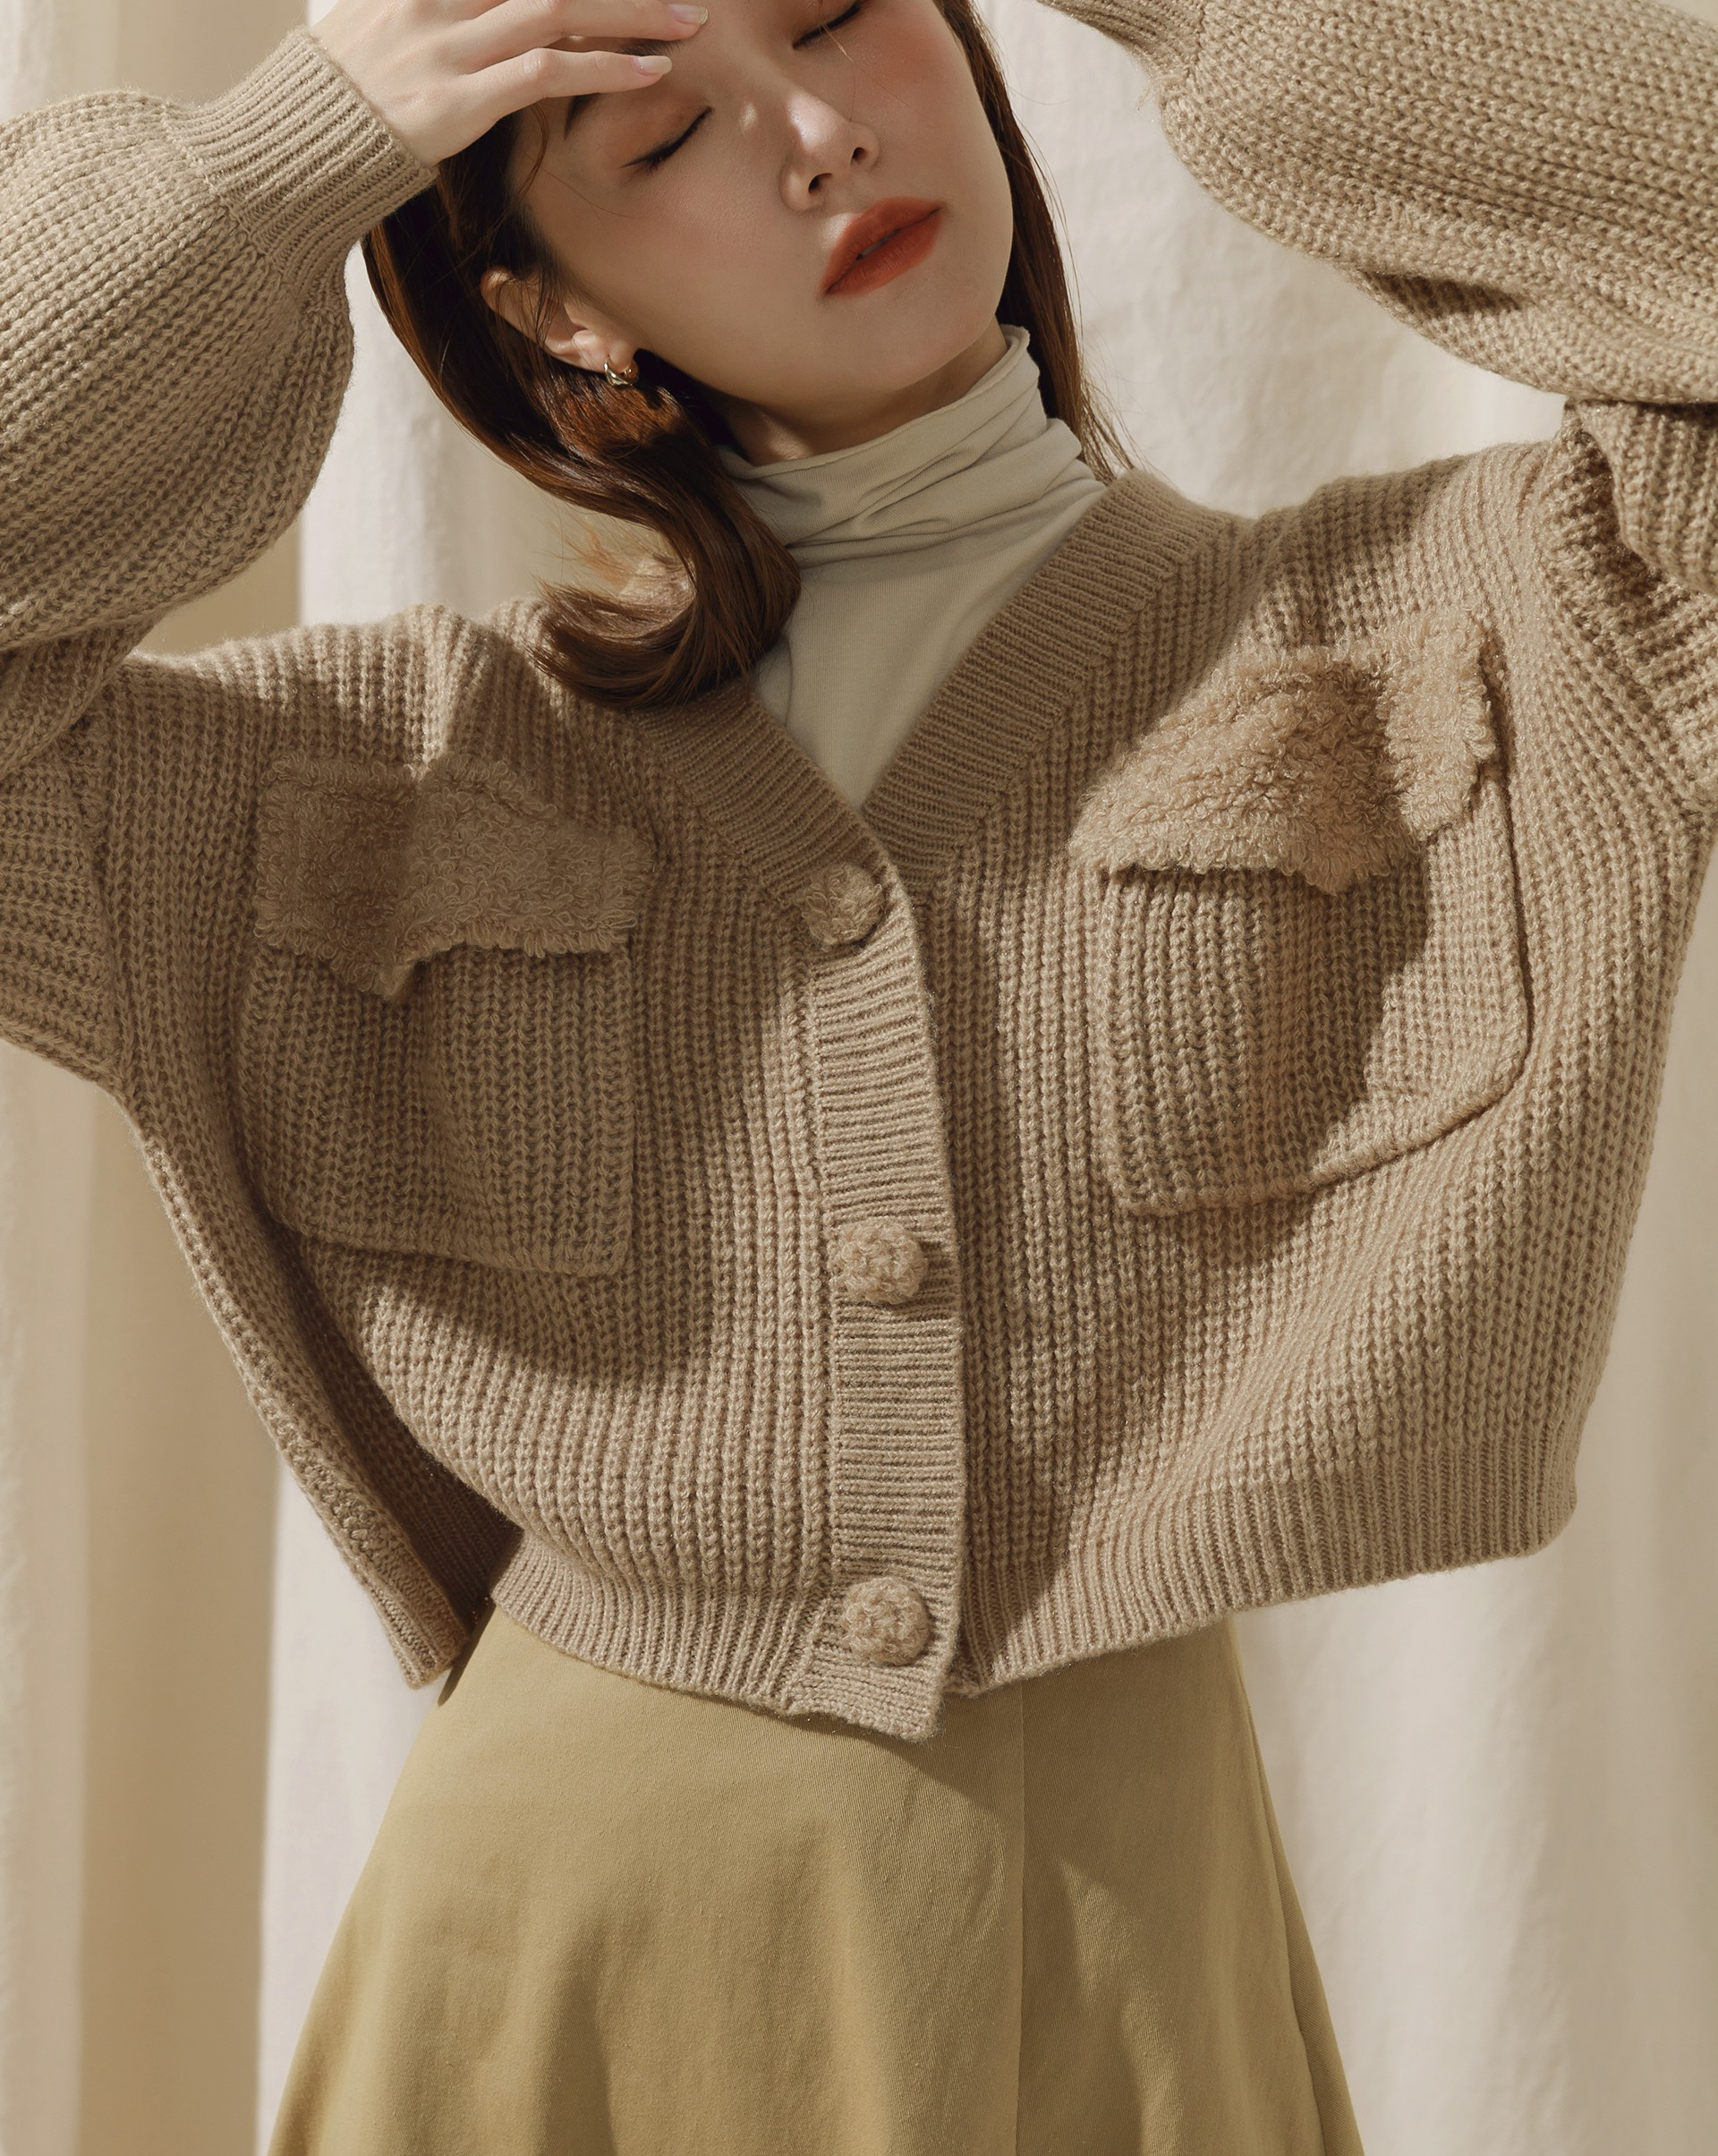 Monroe-毛毛感拼接粗針織寬鬆V領針織外套-Meierq